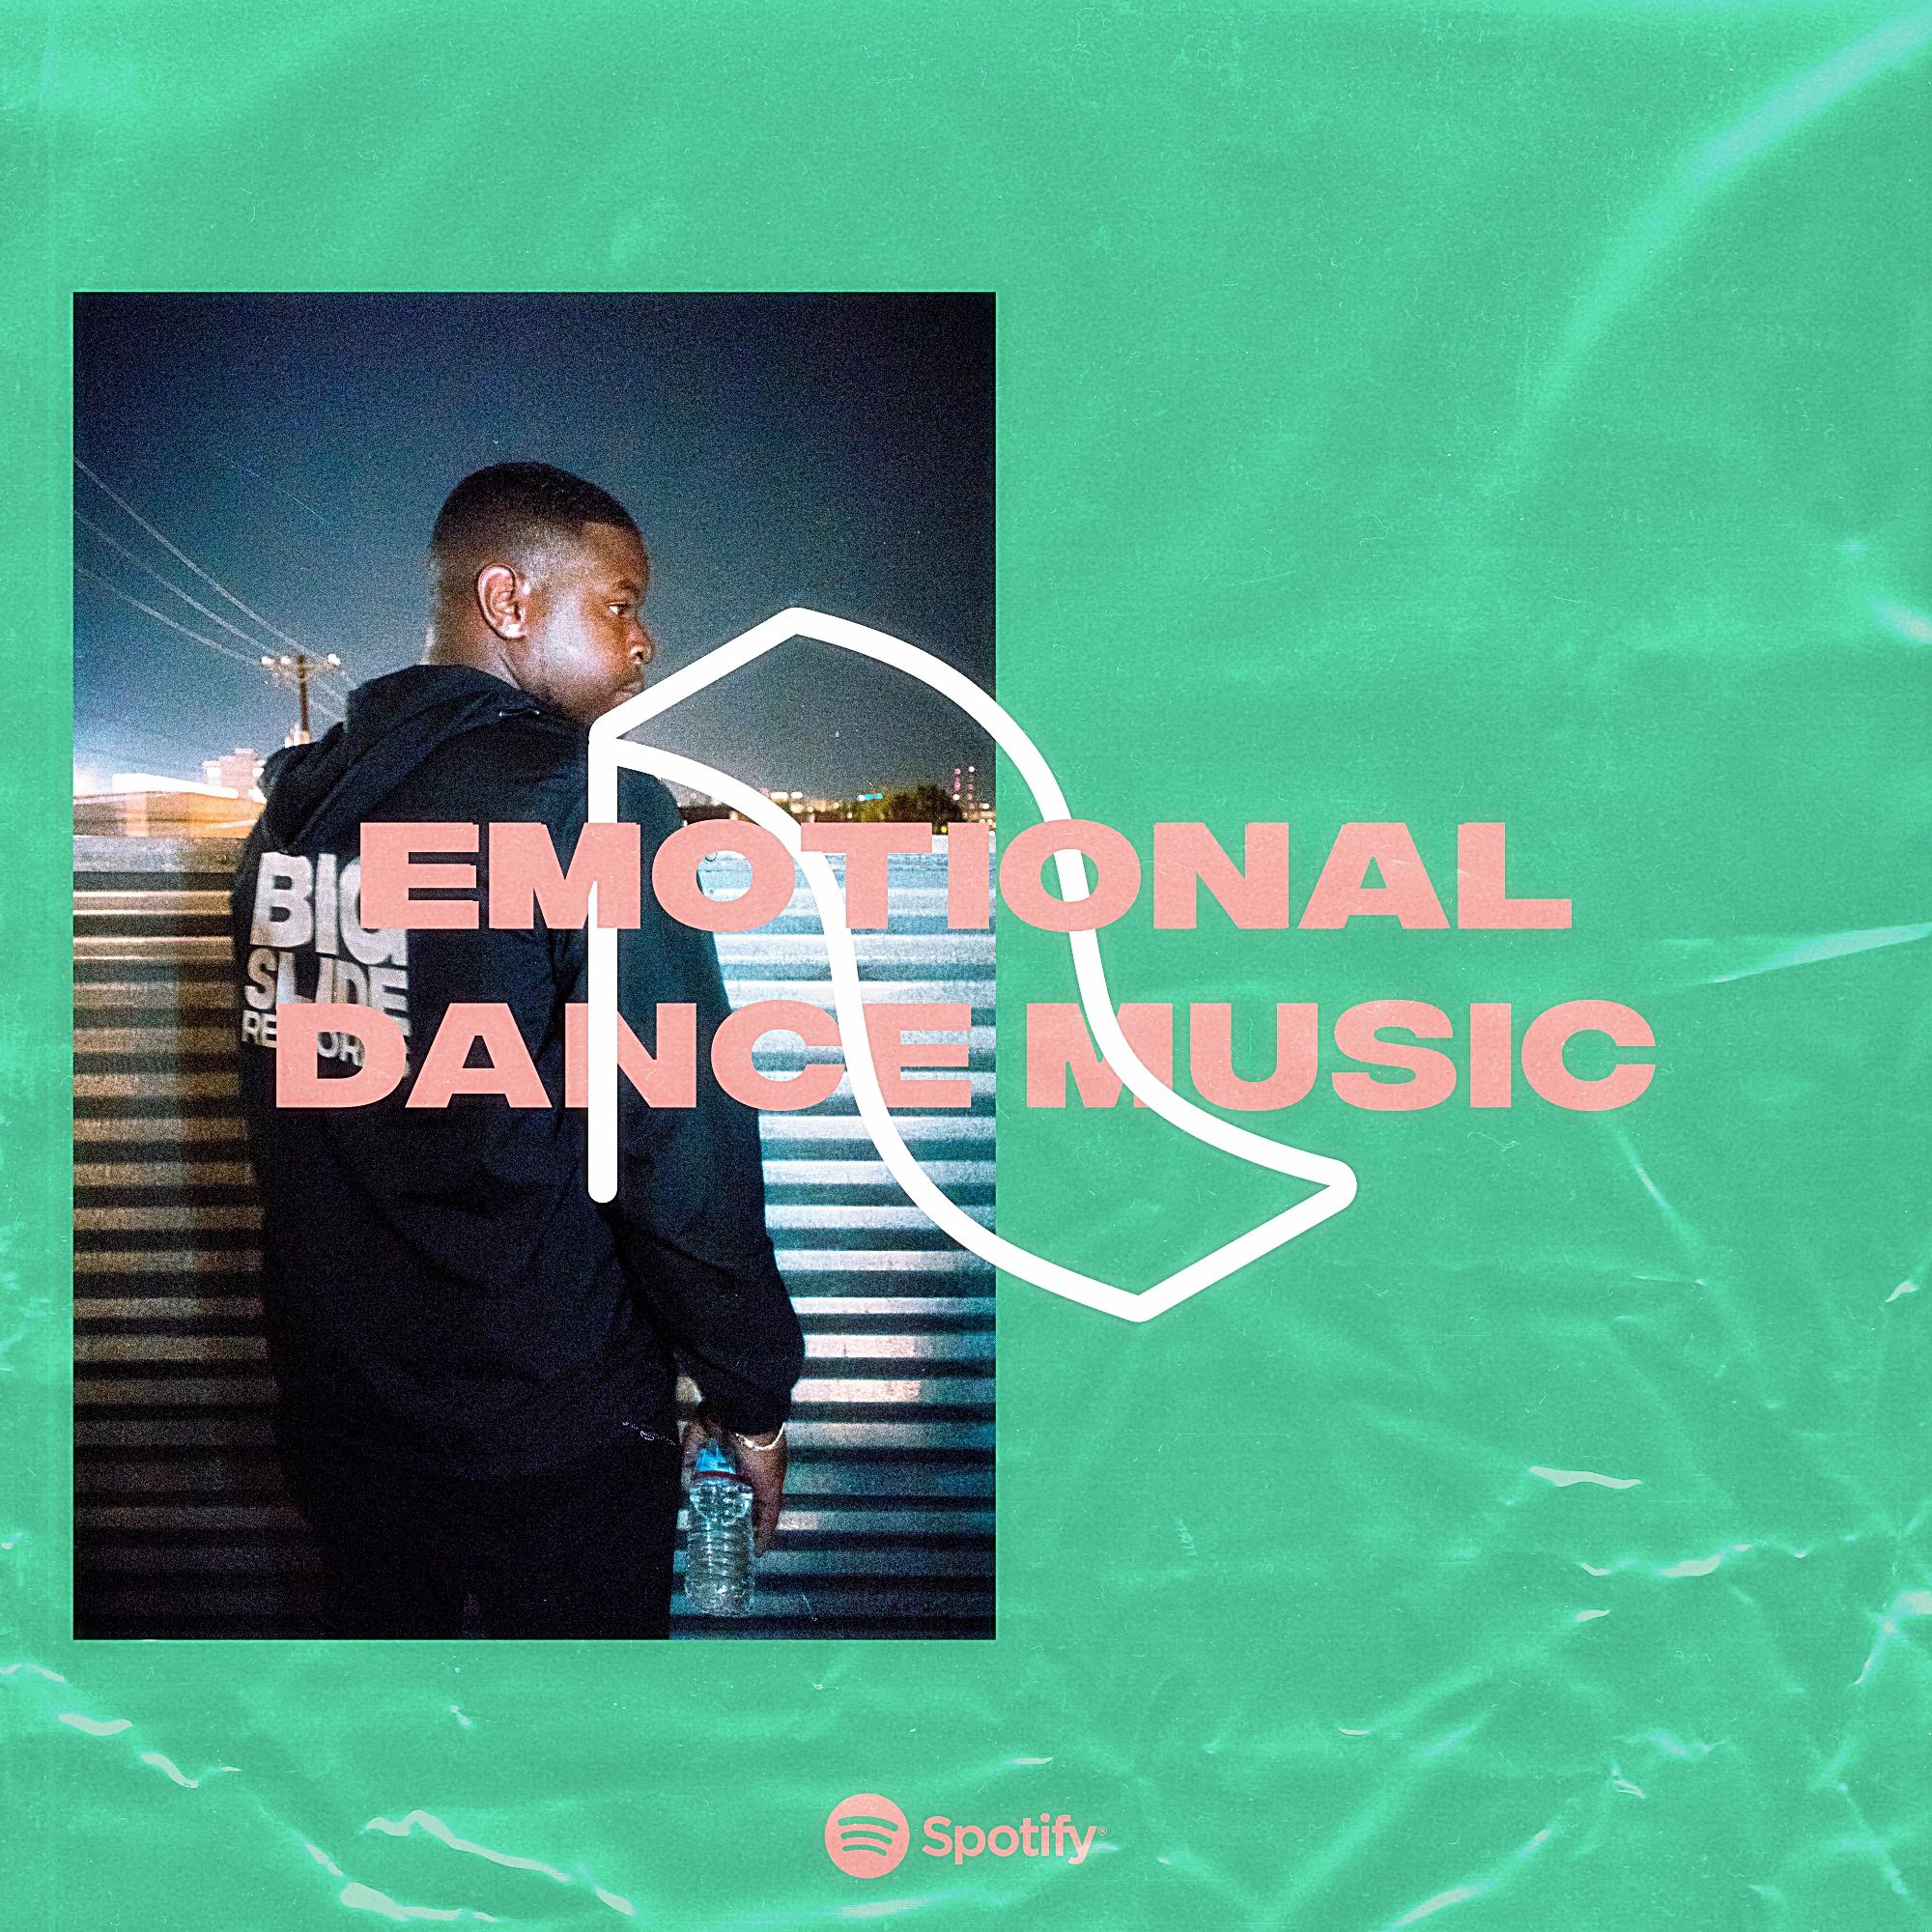 Emotional dance music - By Big Slide Records